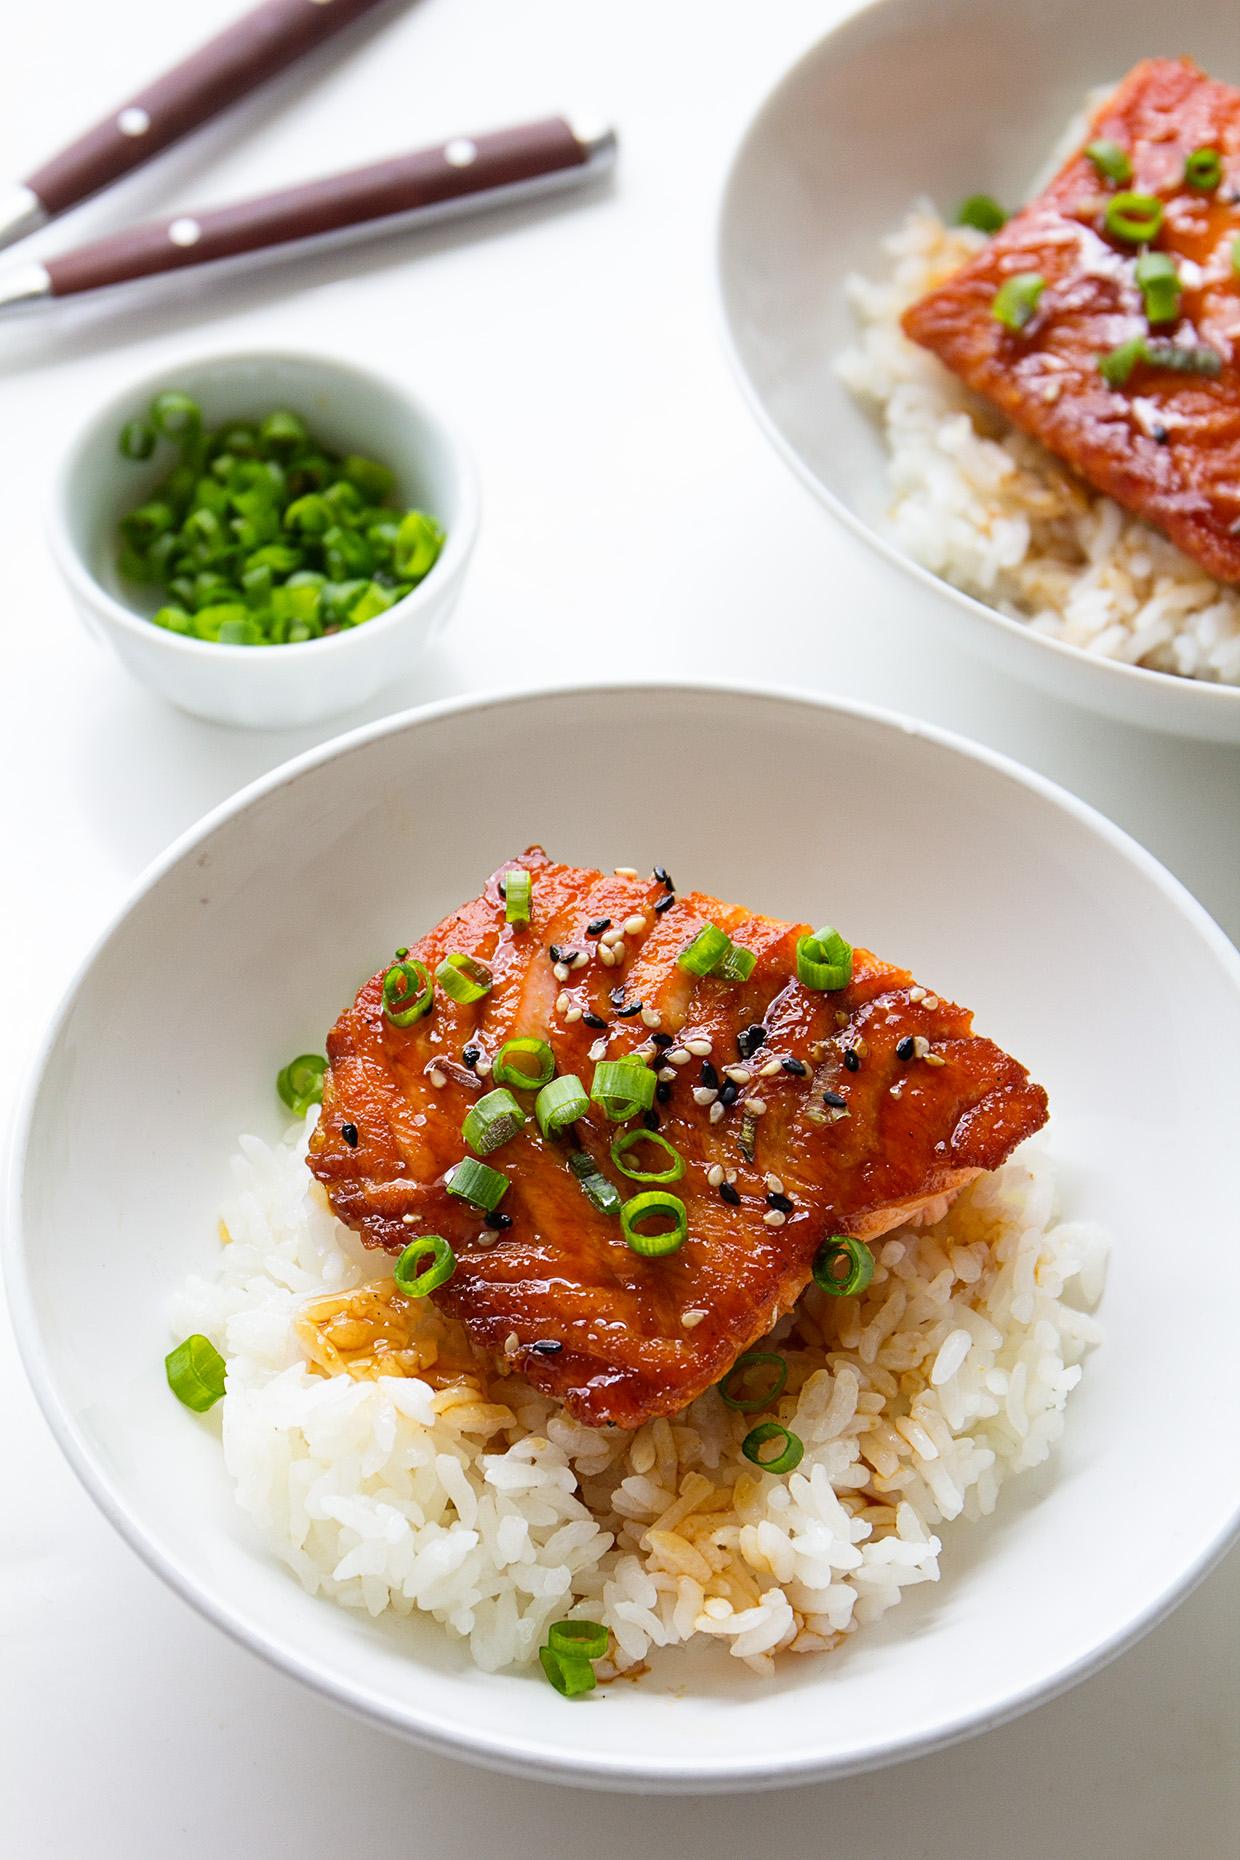 https://realfoodbydad.com/wp-content/uploads/2016/02/salmon-terriyaki-via-real-food-by-dad.jpg